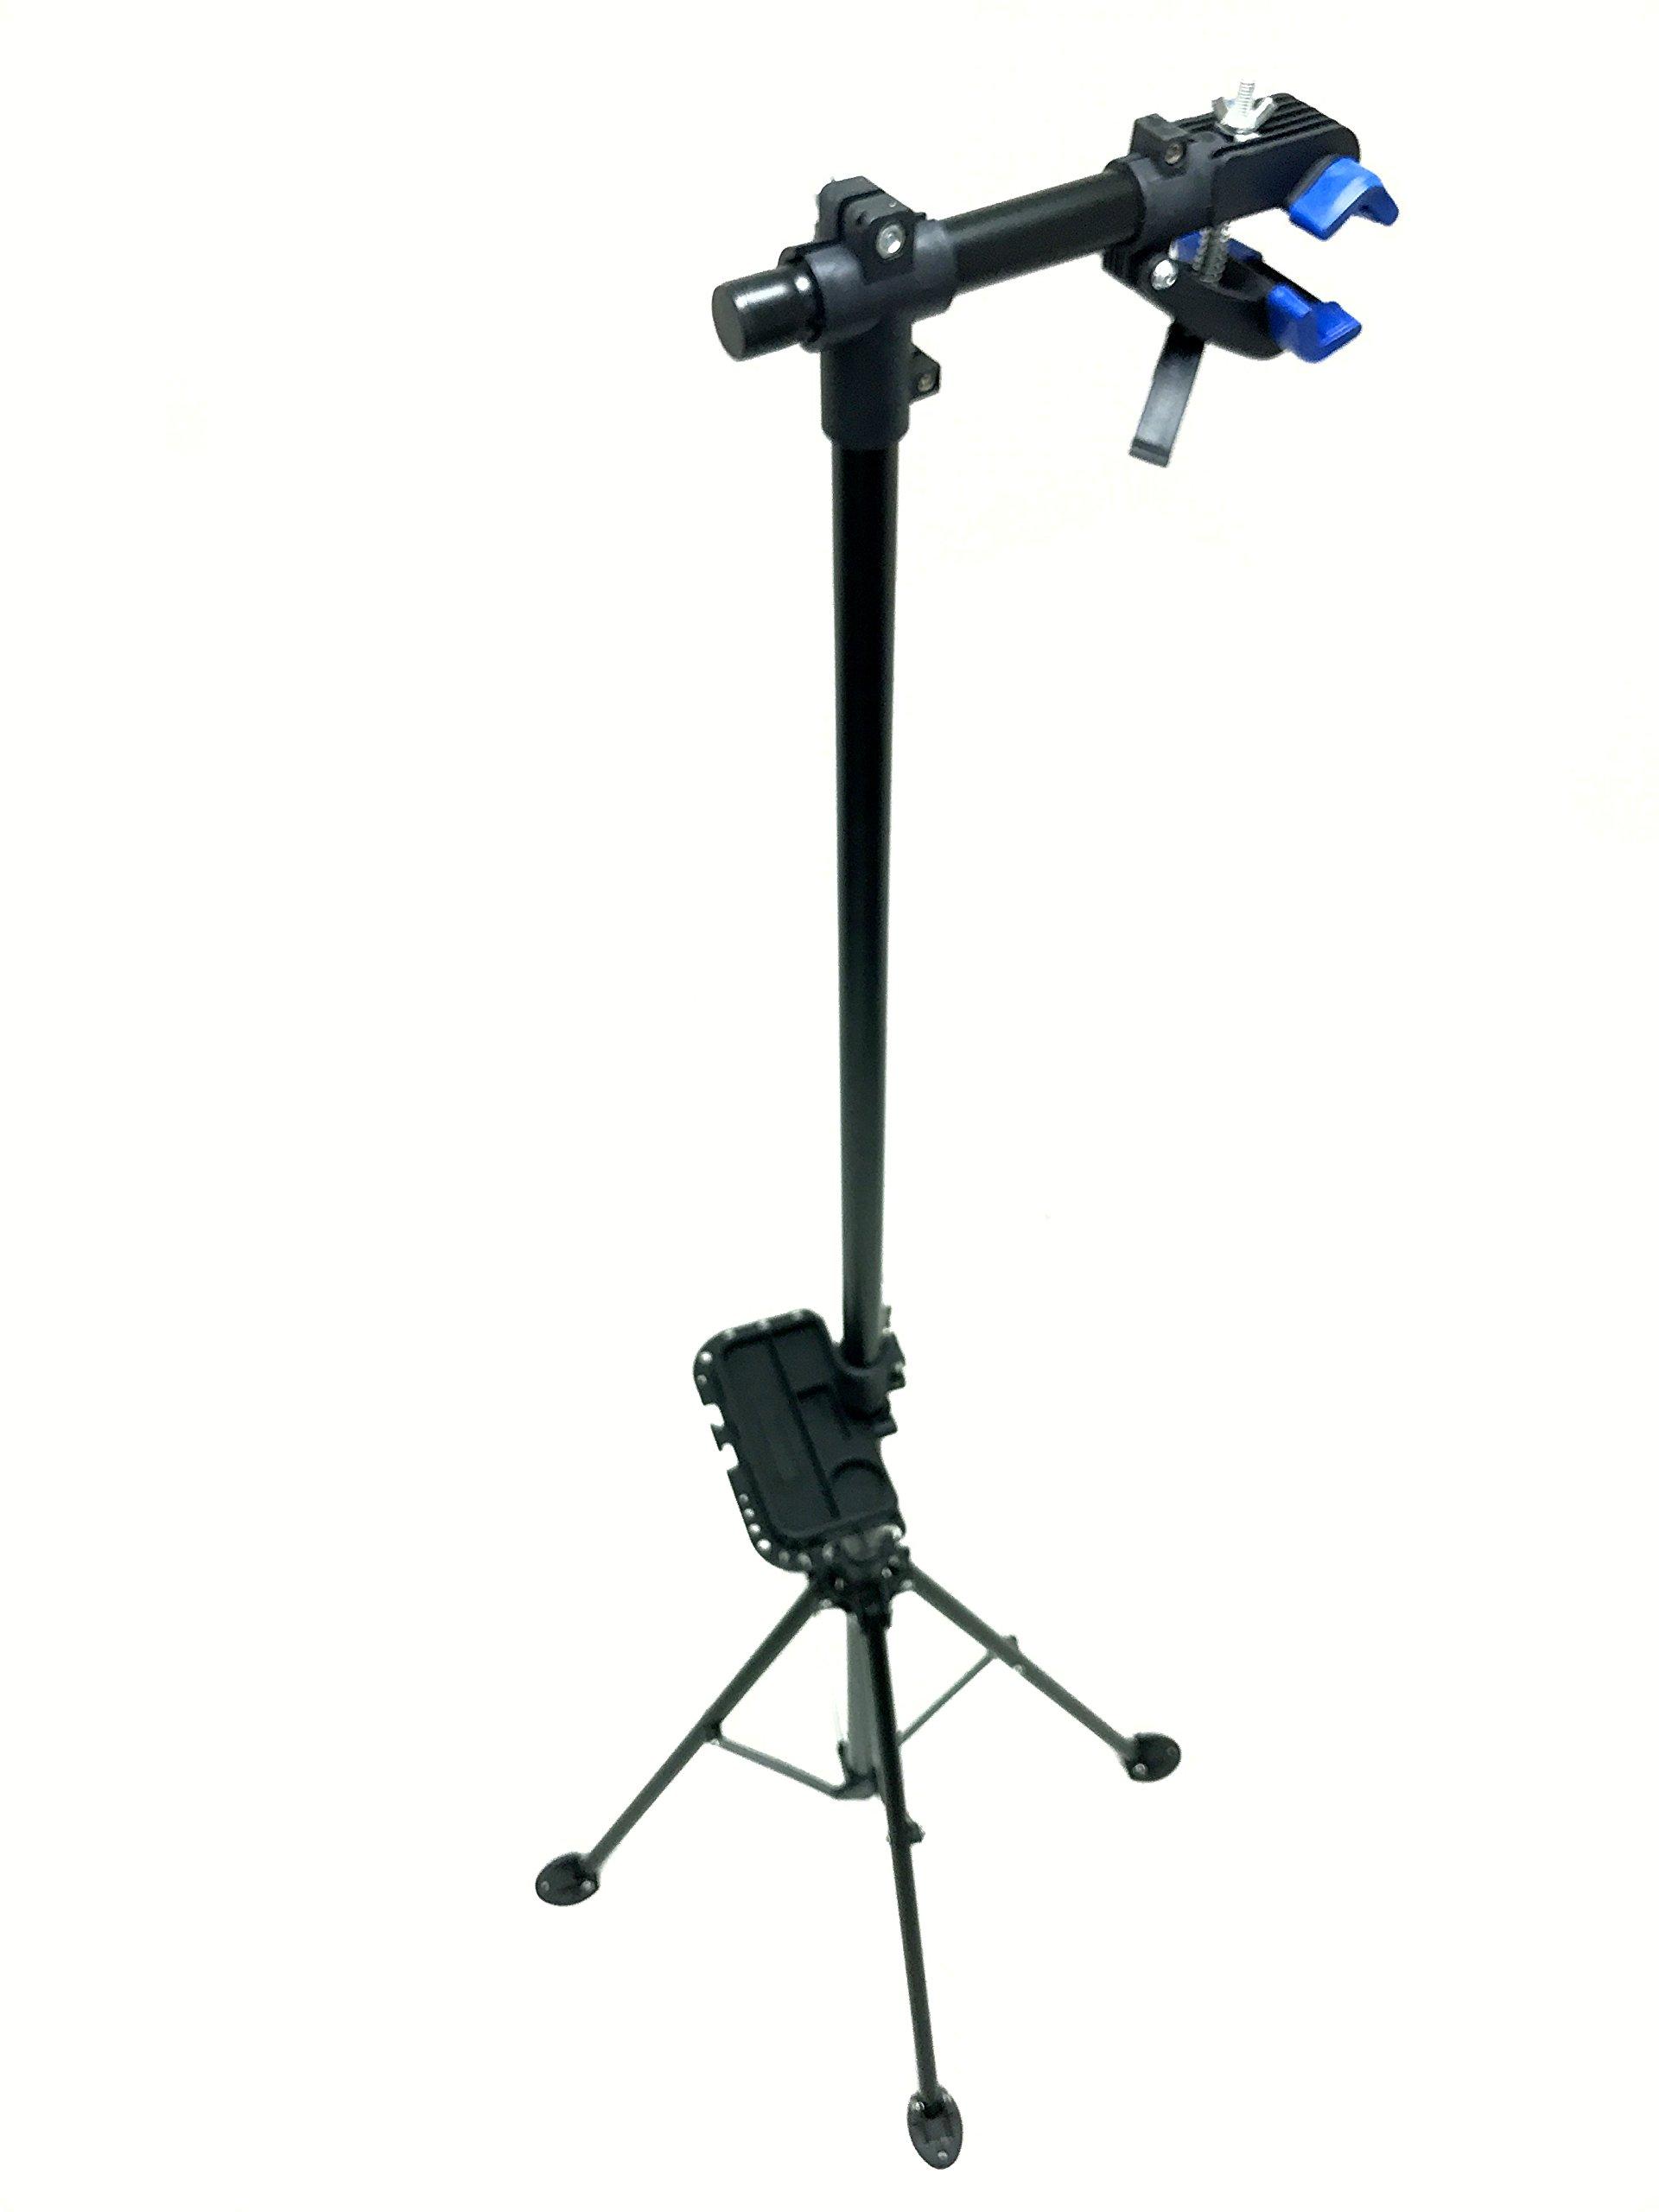 MaxxHaul 80725 Bike Repair Stand/Display with Adjustable Height & 360 Deg. Rotating Head Clamp by MaxxHaul (Image #1)